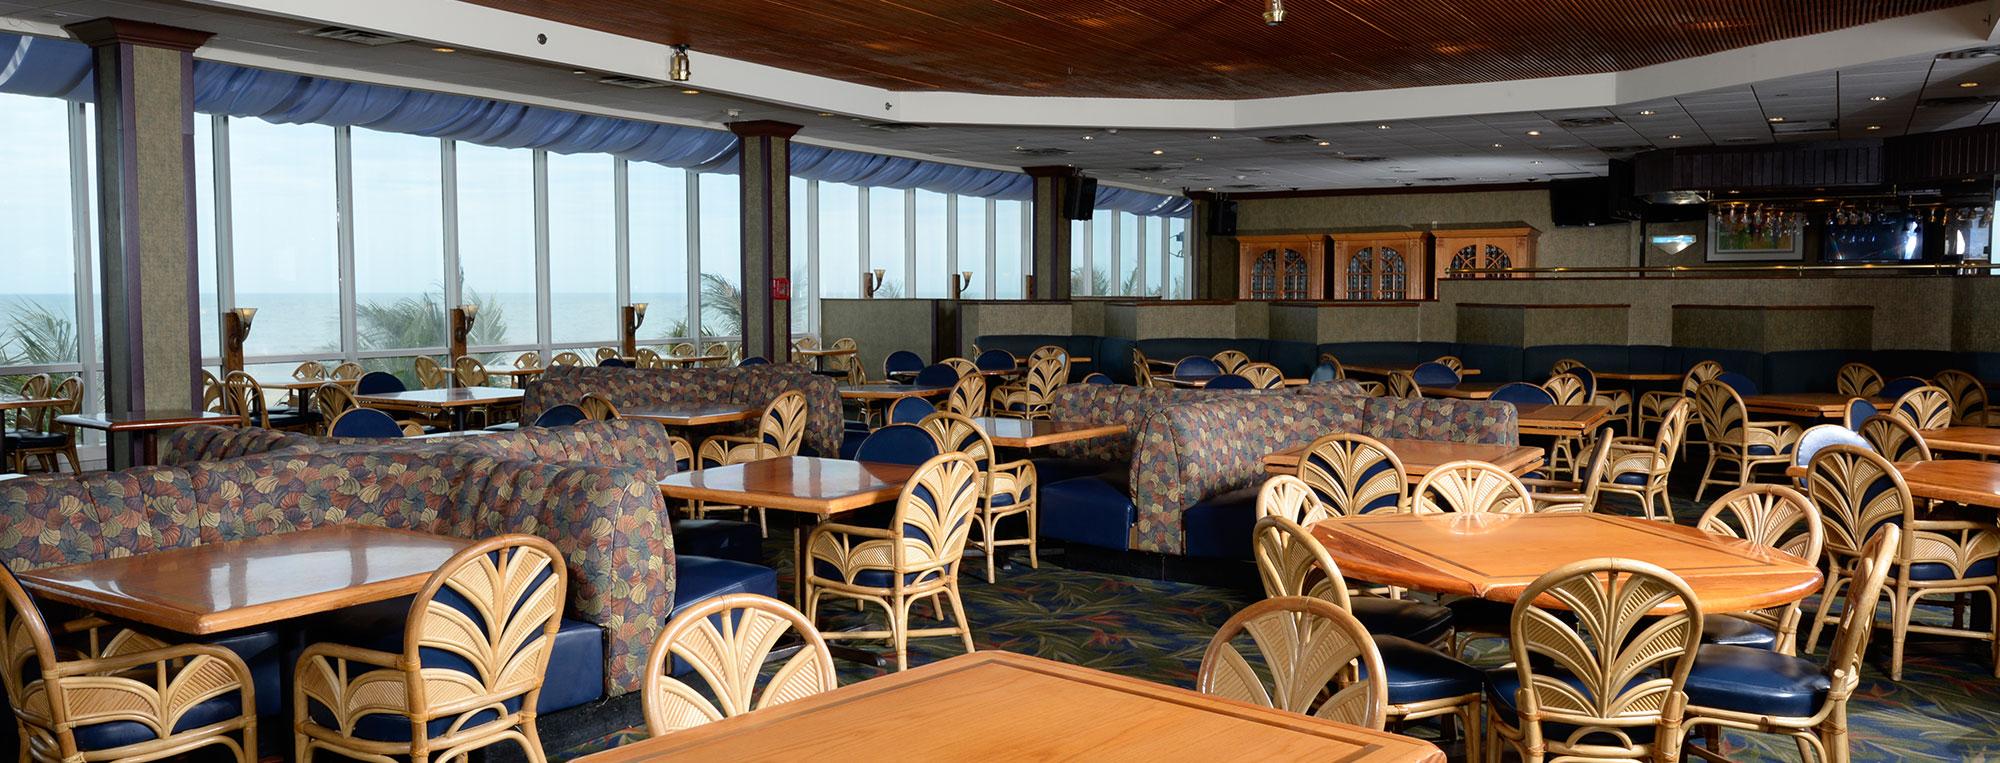 Anchor Restaurant inside look Ocean City Work and Travel IECenter